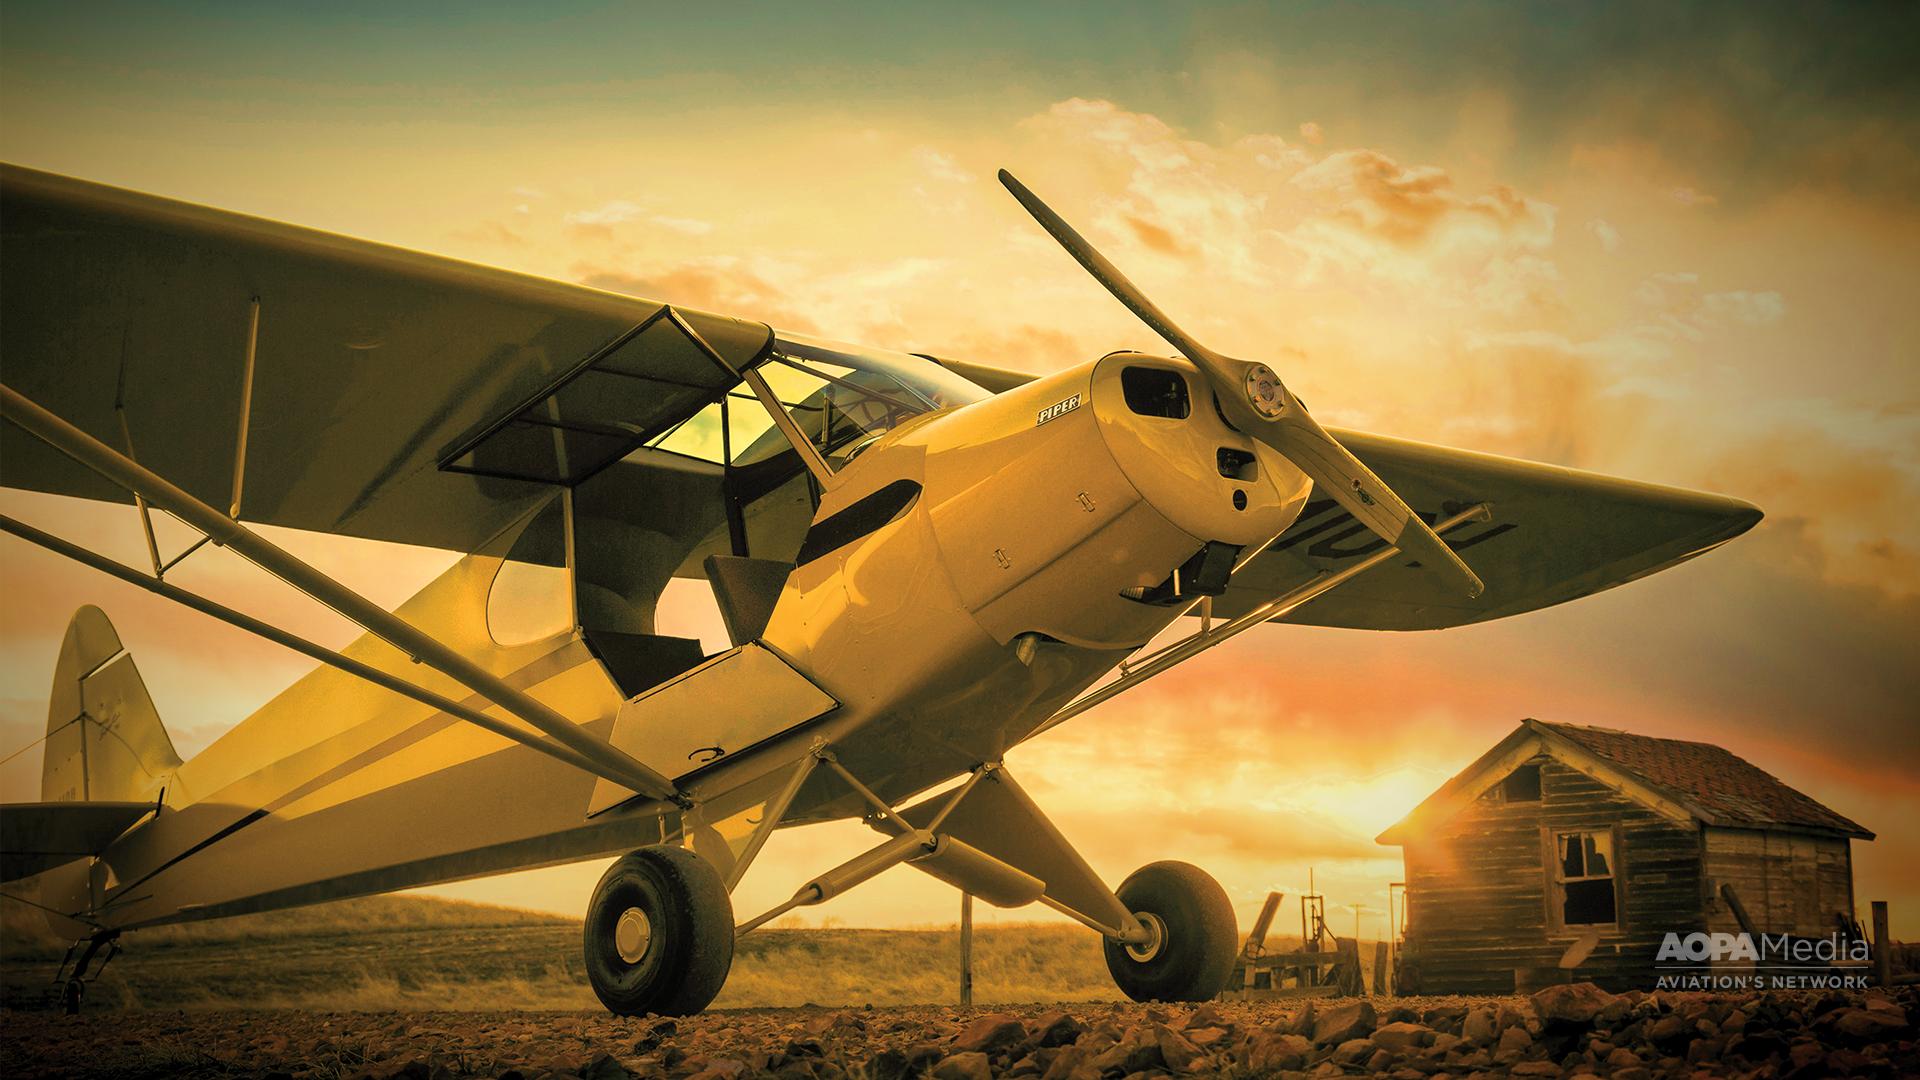 piper aircraft wallpaper the - photo #4